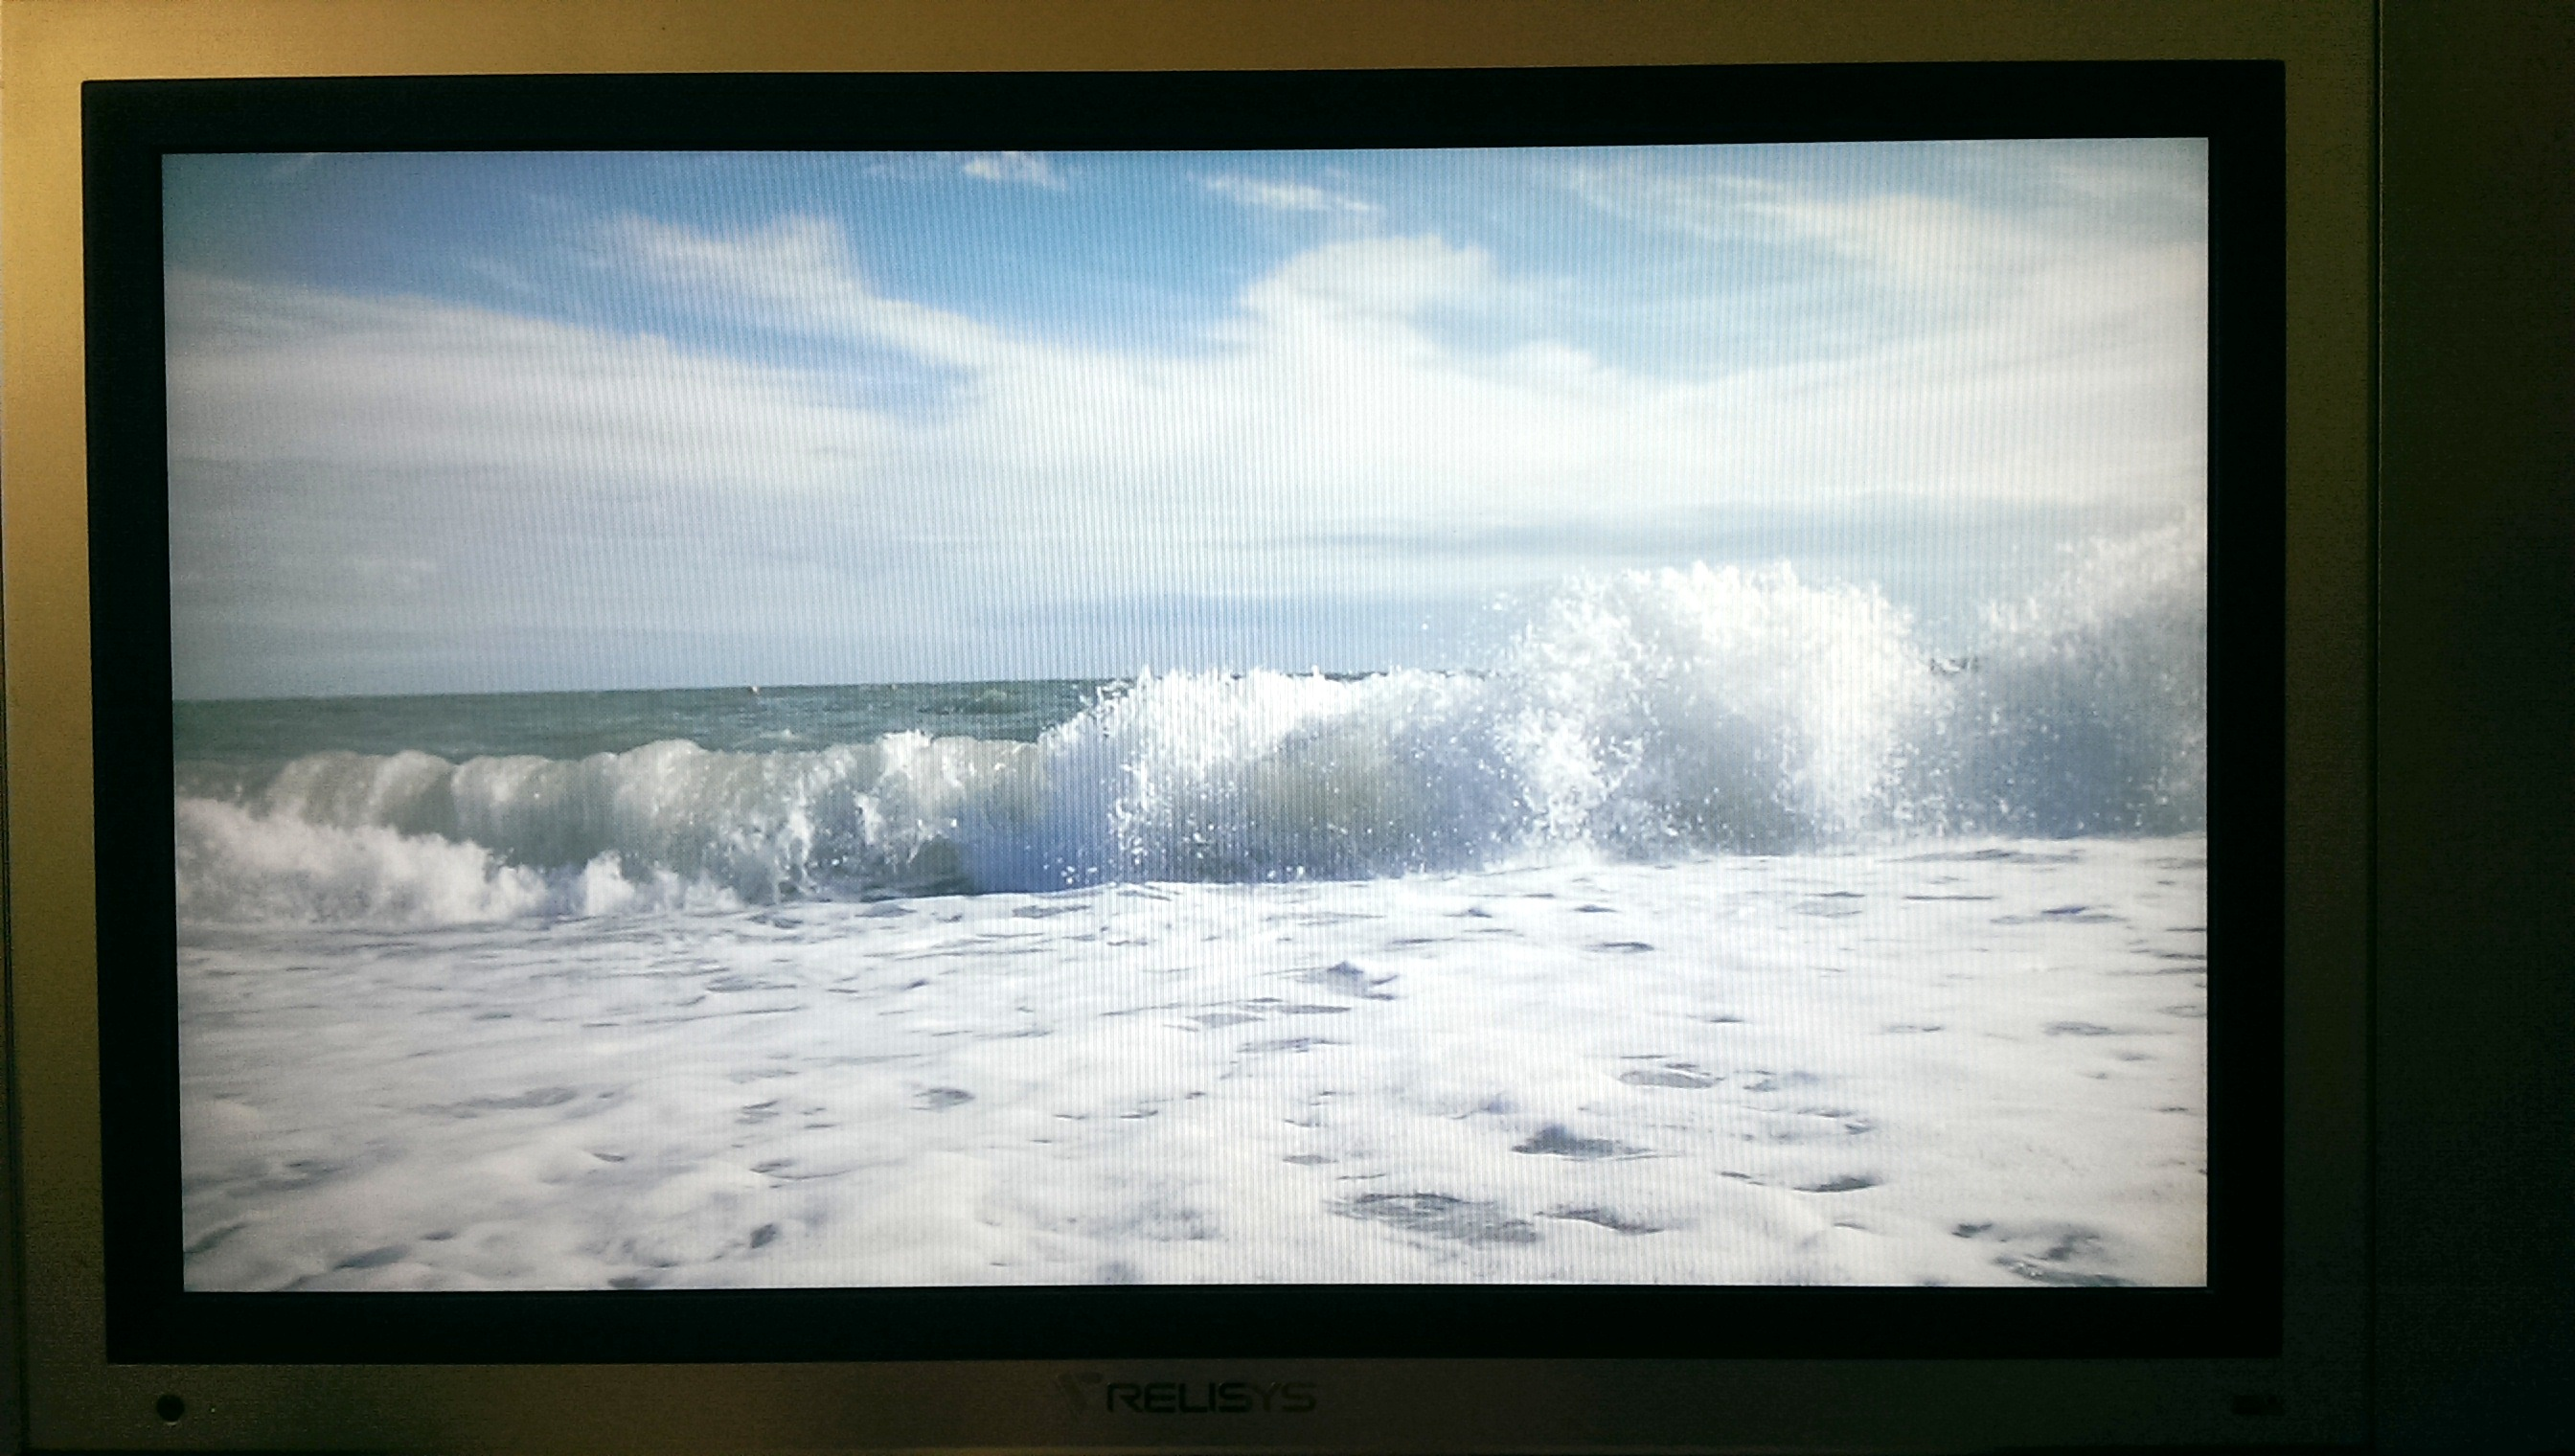 78830_TV_set.jpg